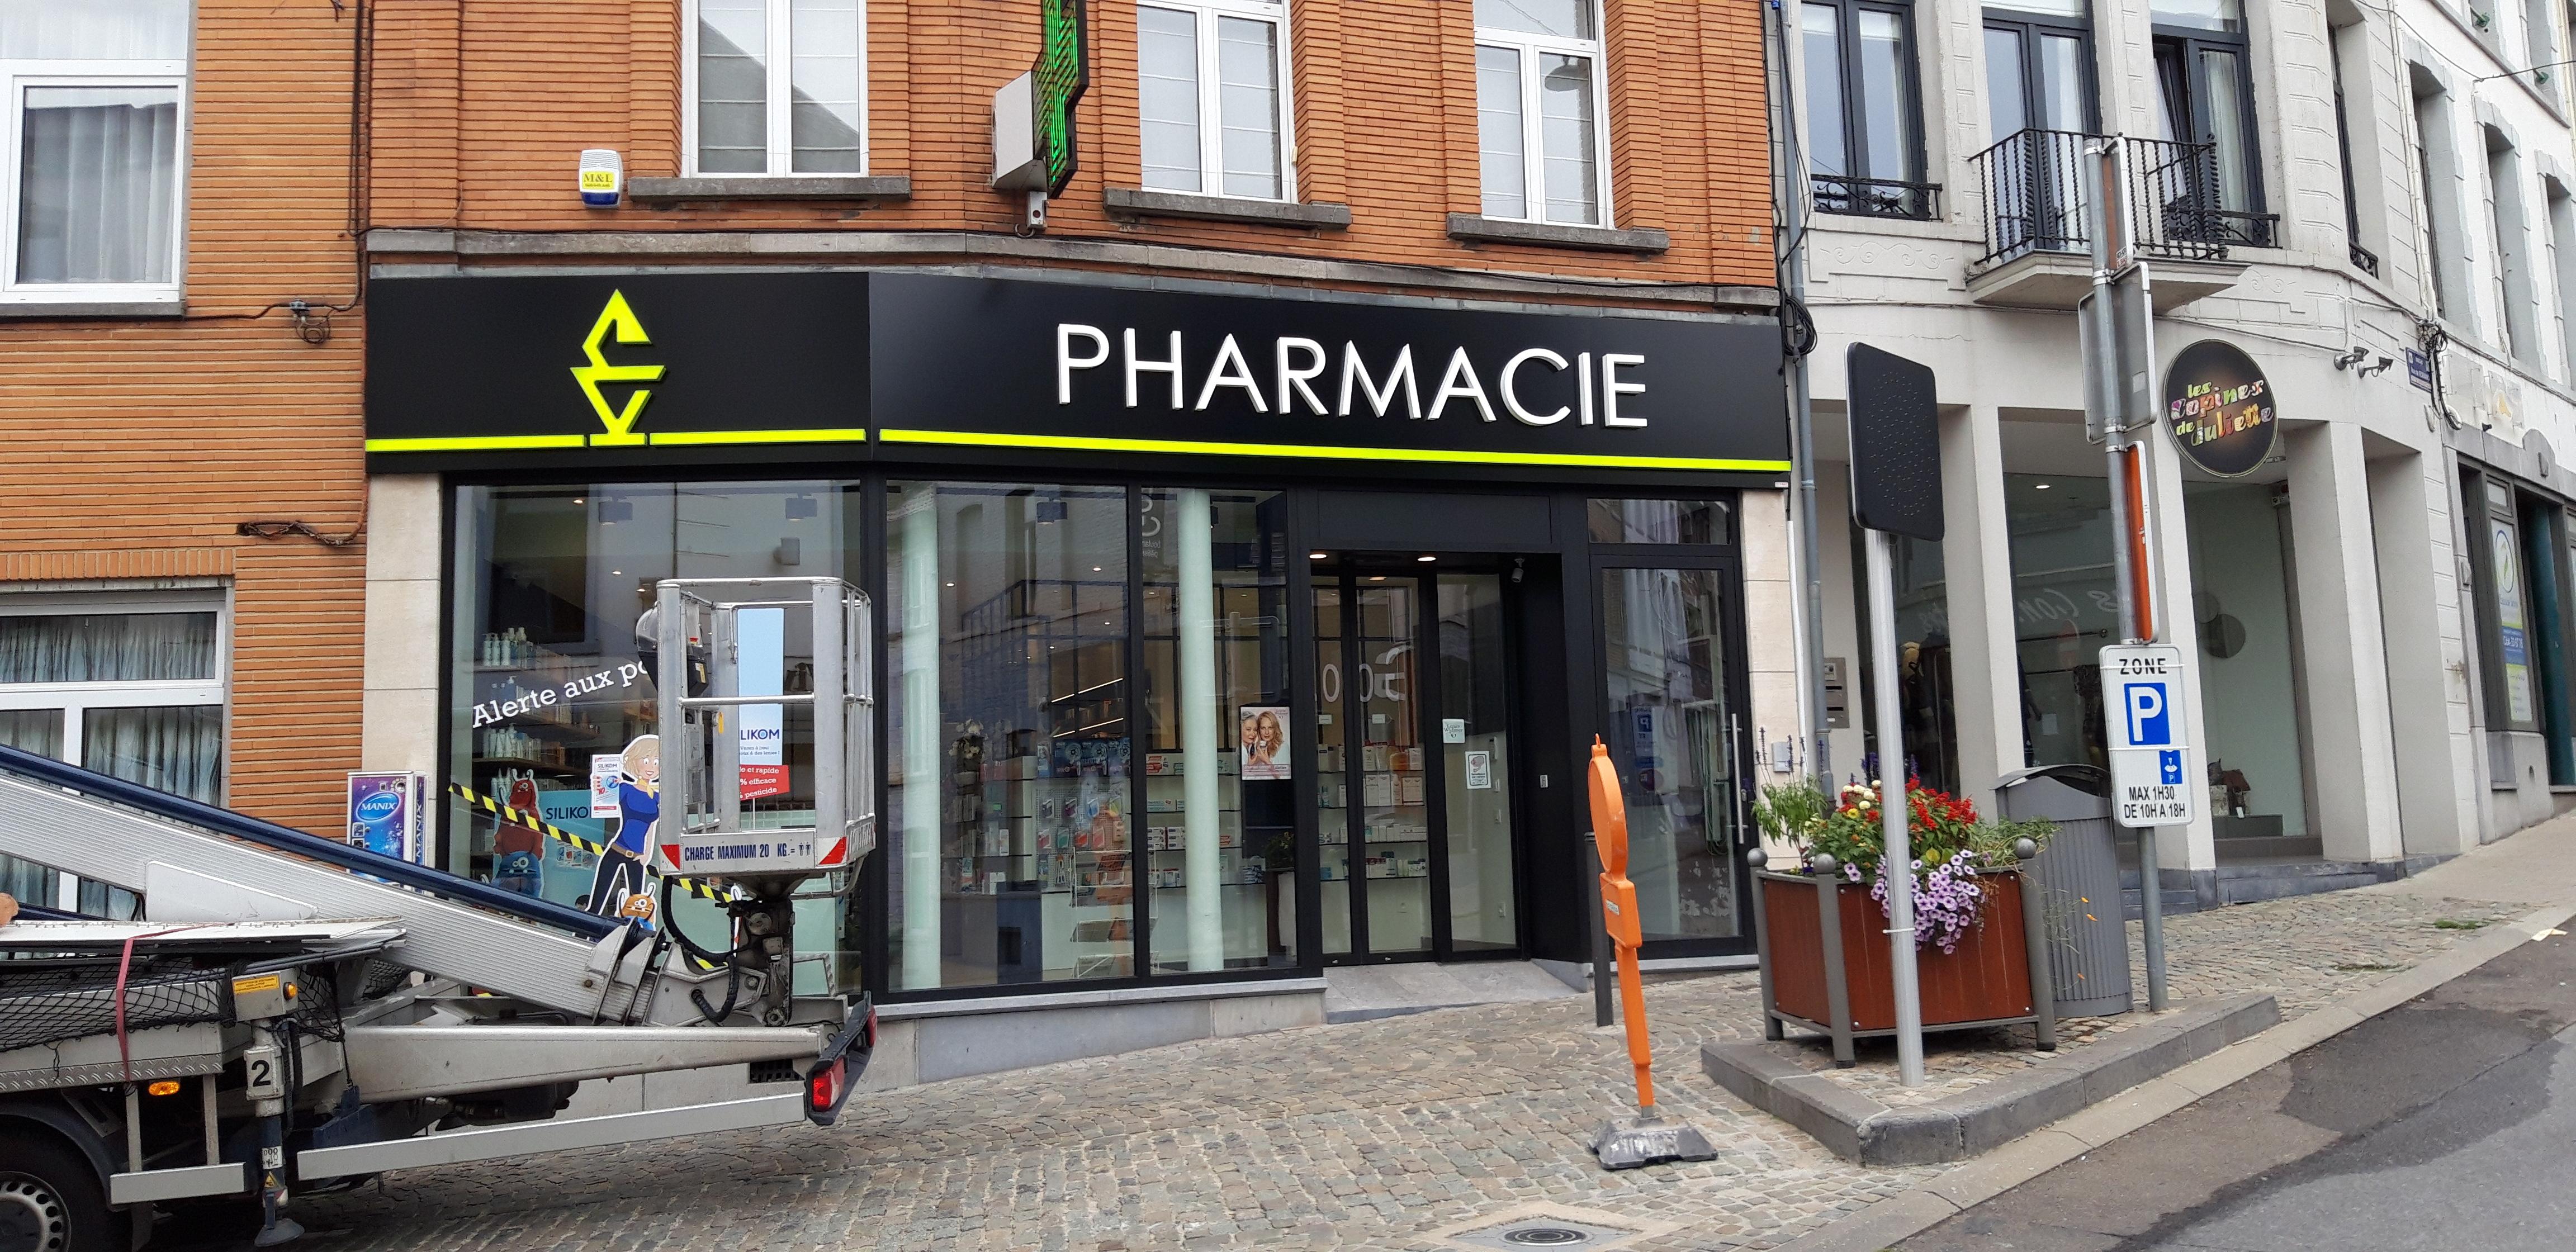 Enseigne et croix de pharmacie - Pharmacie Binche